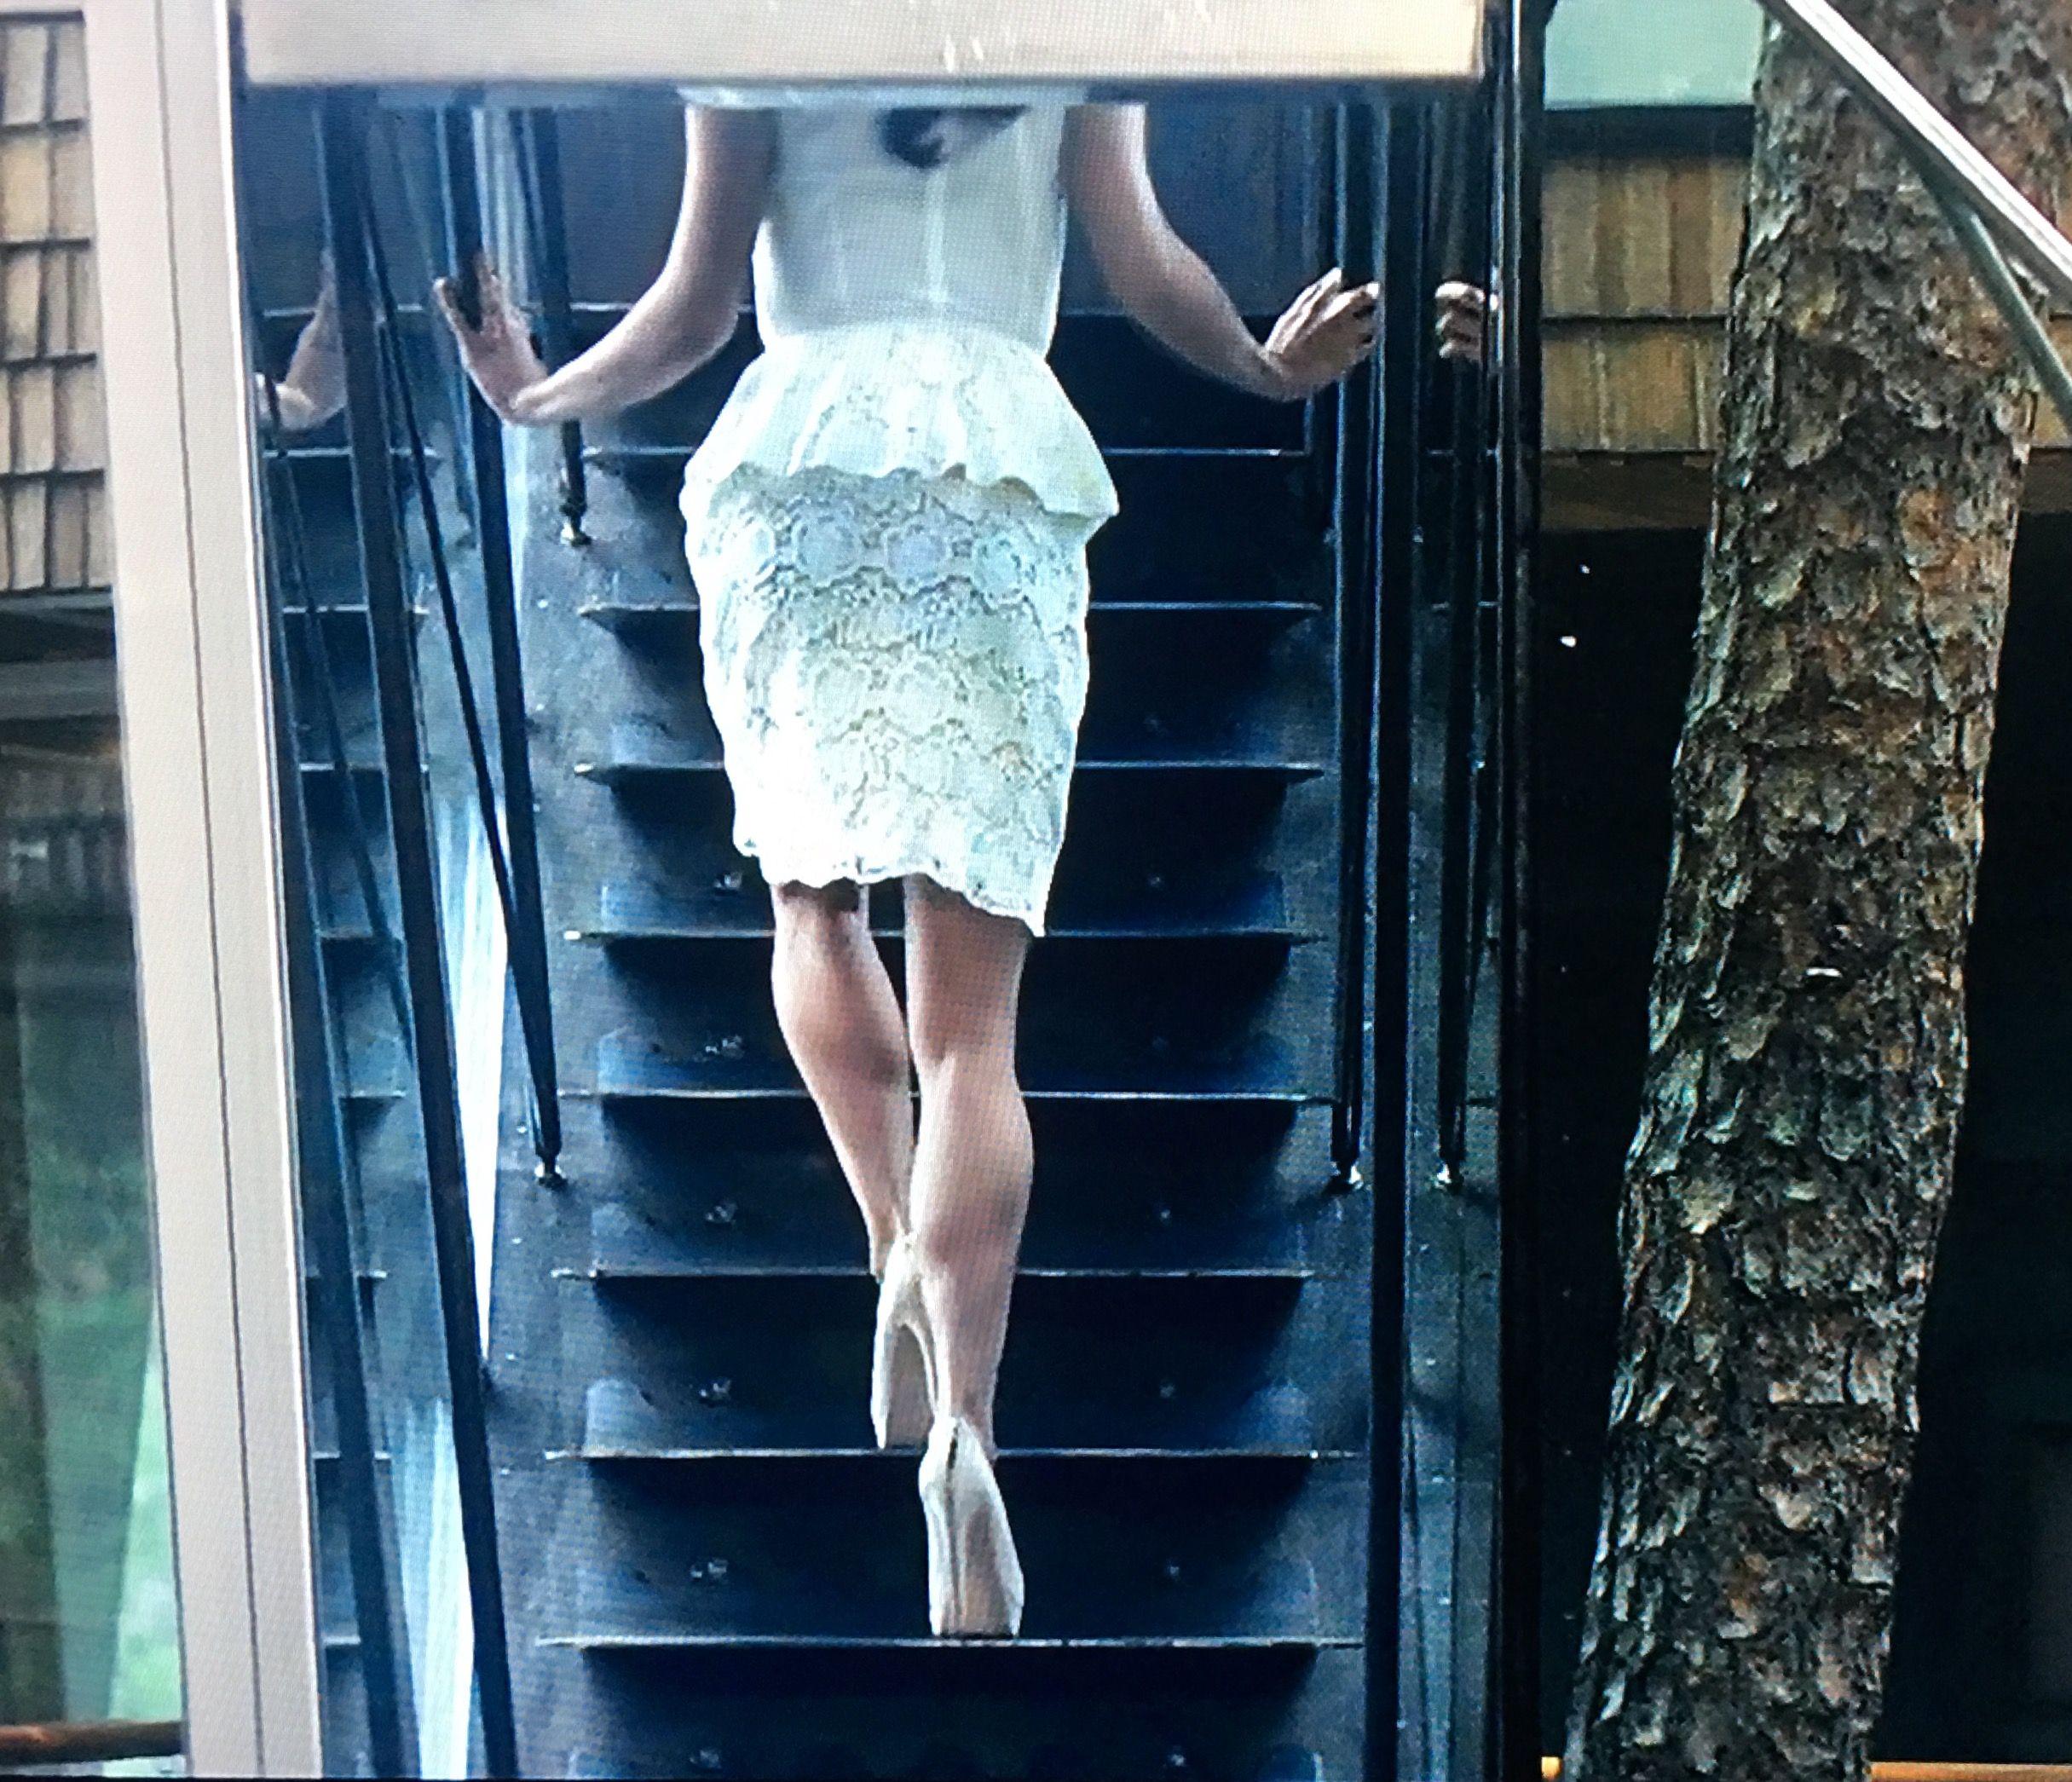 alicia vikander leggy in white and sky high heels in ex machina